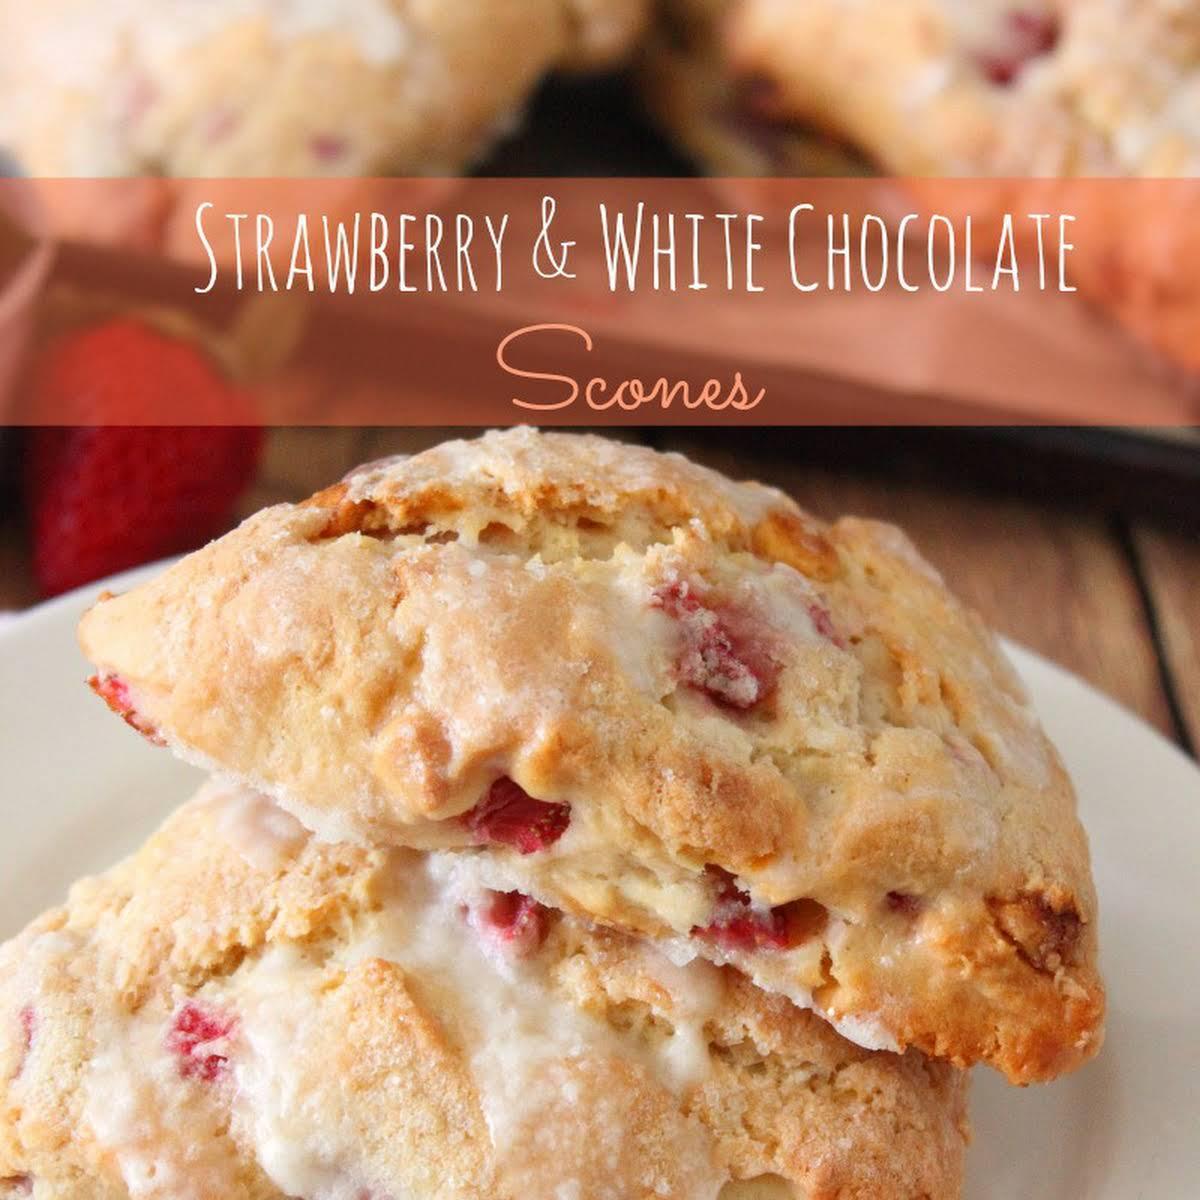 Strawberry White Chocolate Scones